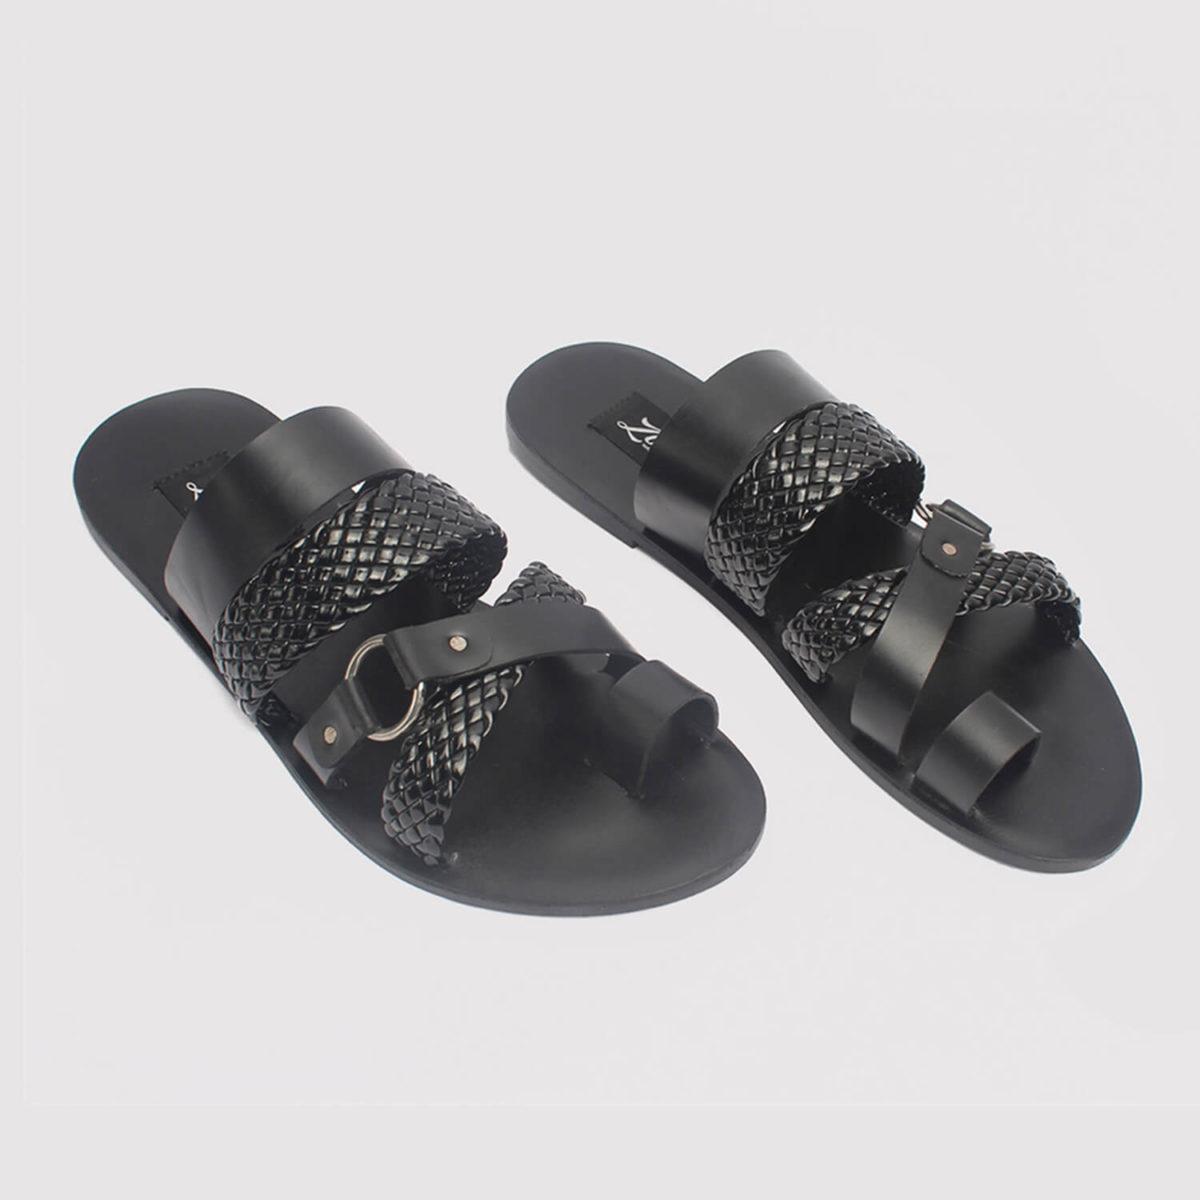 dandi toe slippers black leather zorkle shoes in lagos nigeria